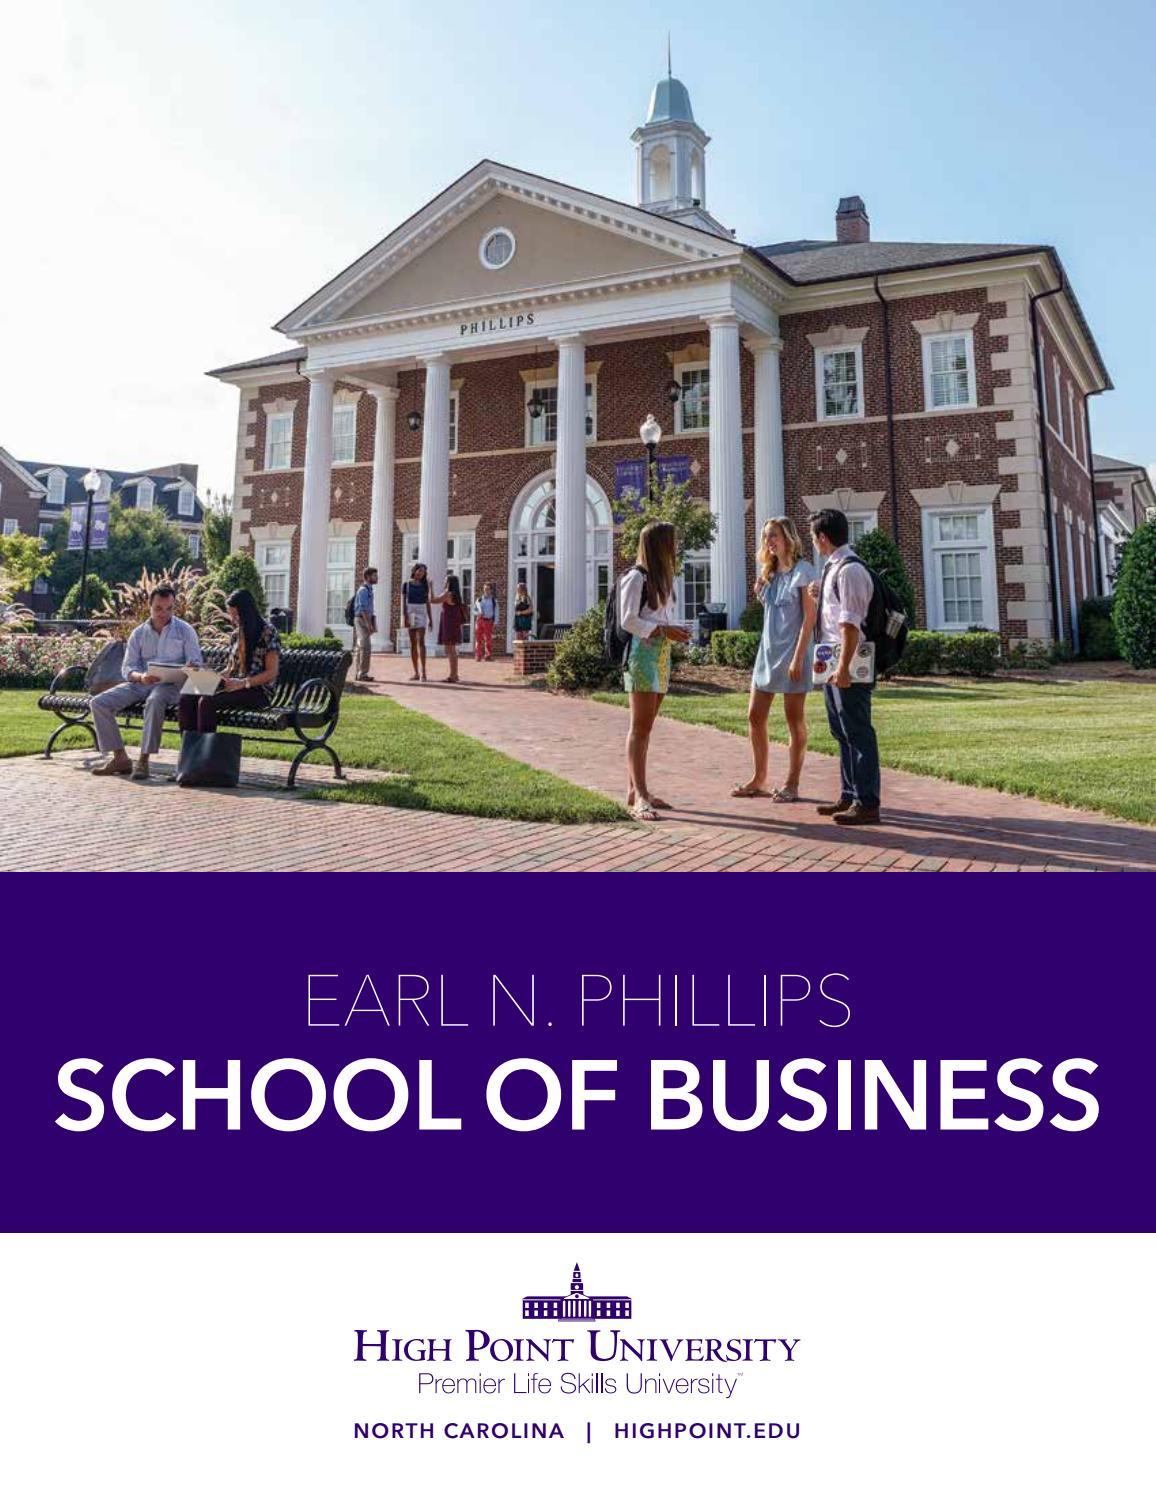 Academic Prospectus: Earl N  Phillips School of Business by